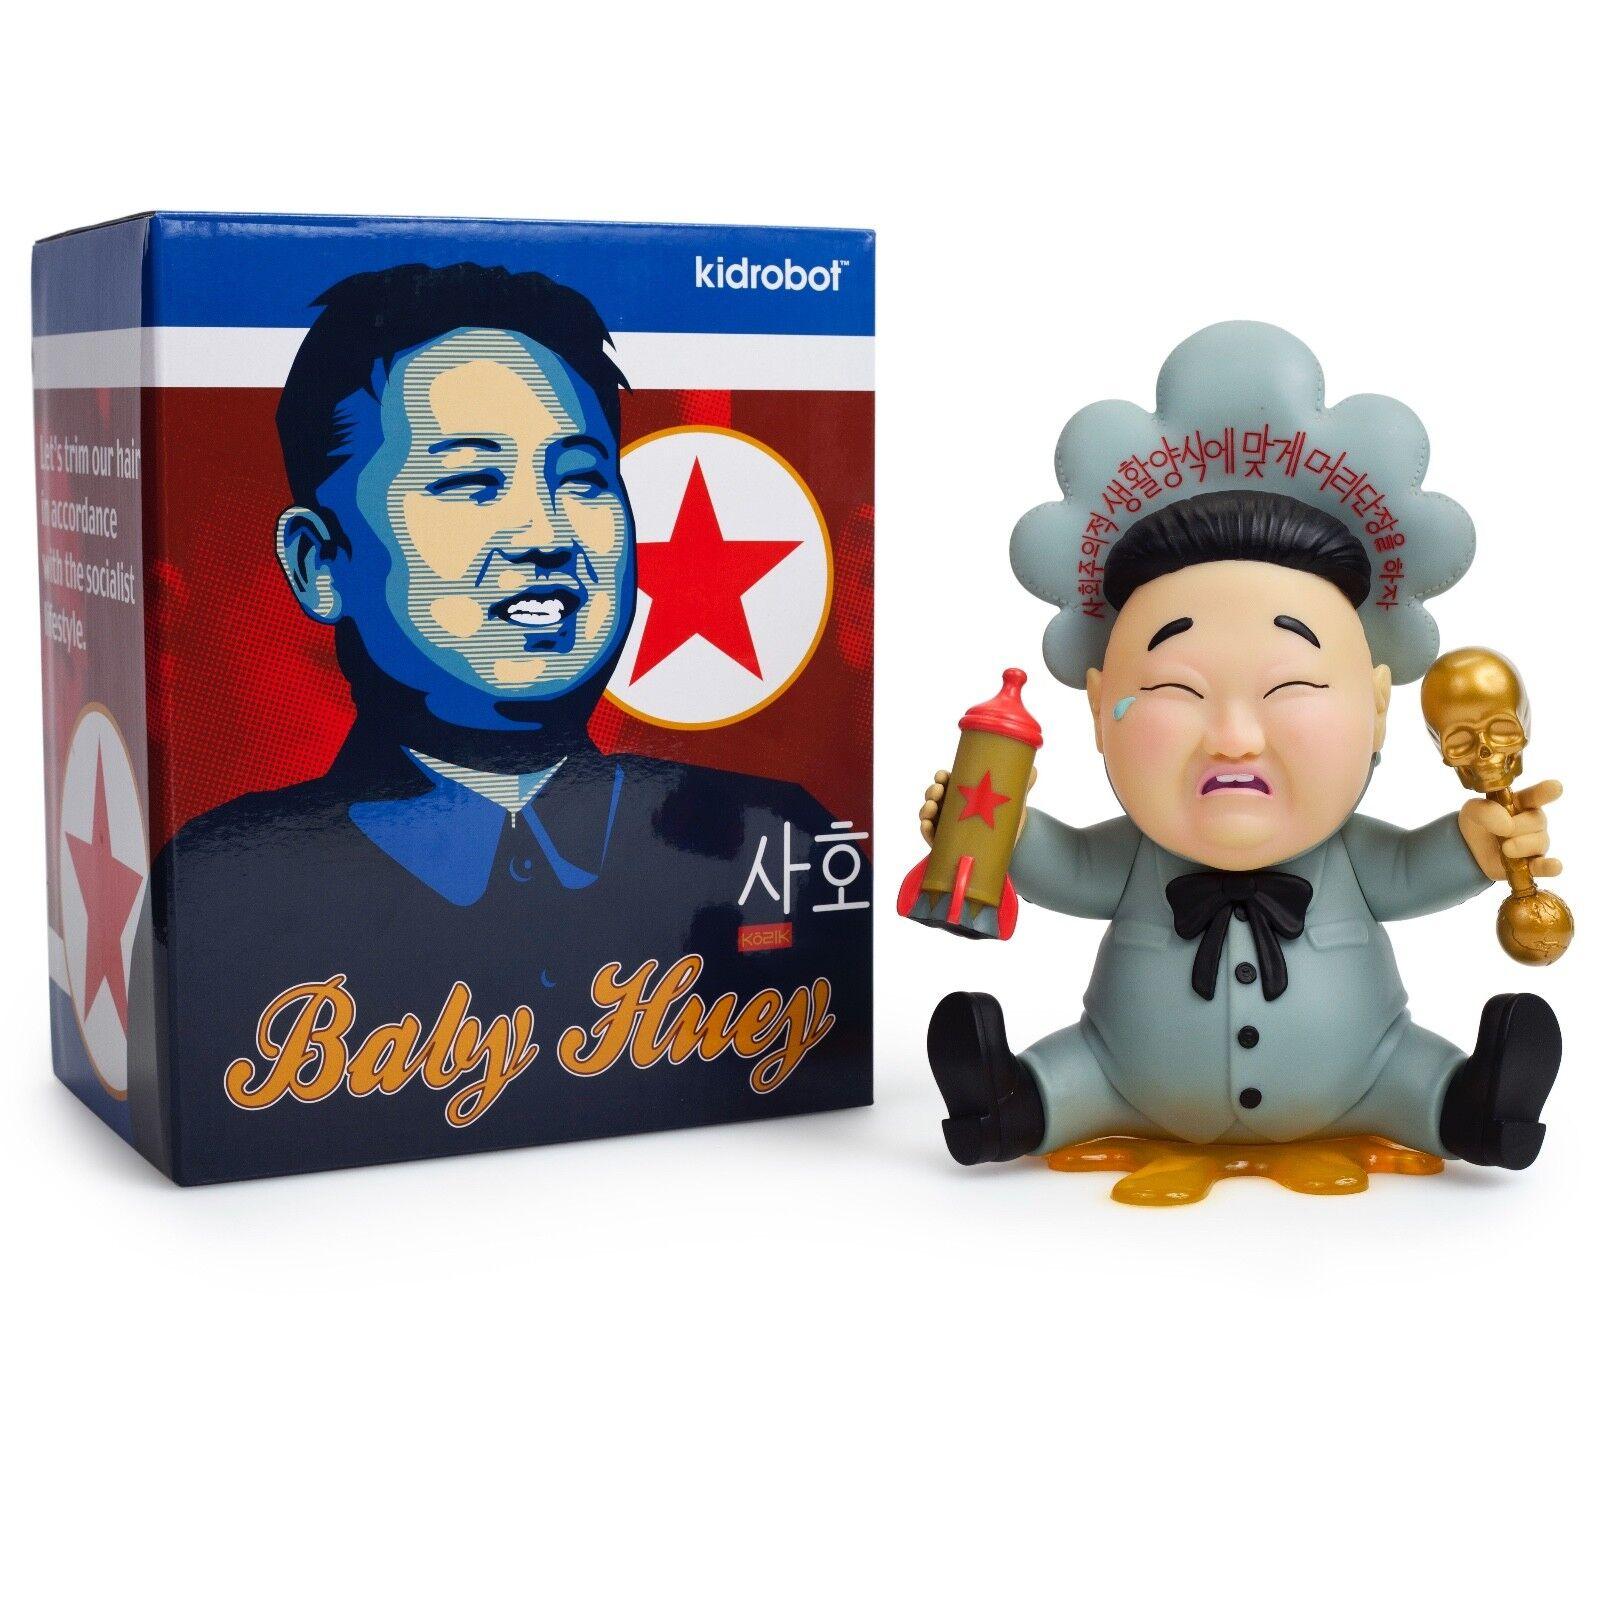 Kidrobot | Baby Huey Blau  by Frank Kozik | 8 Inch Vinyl Figure